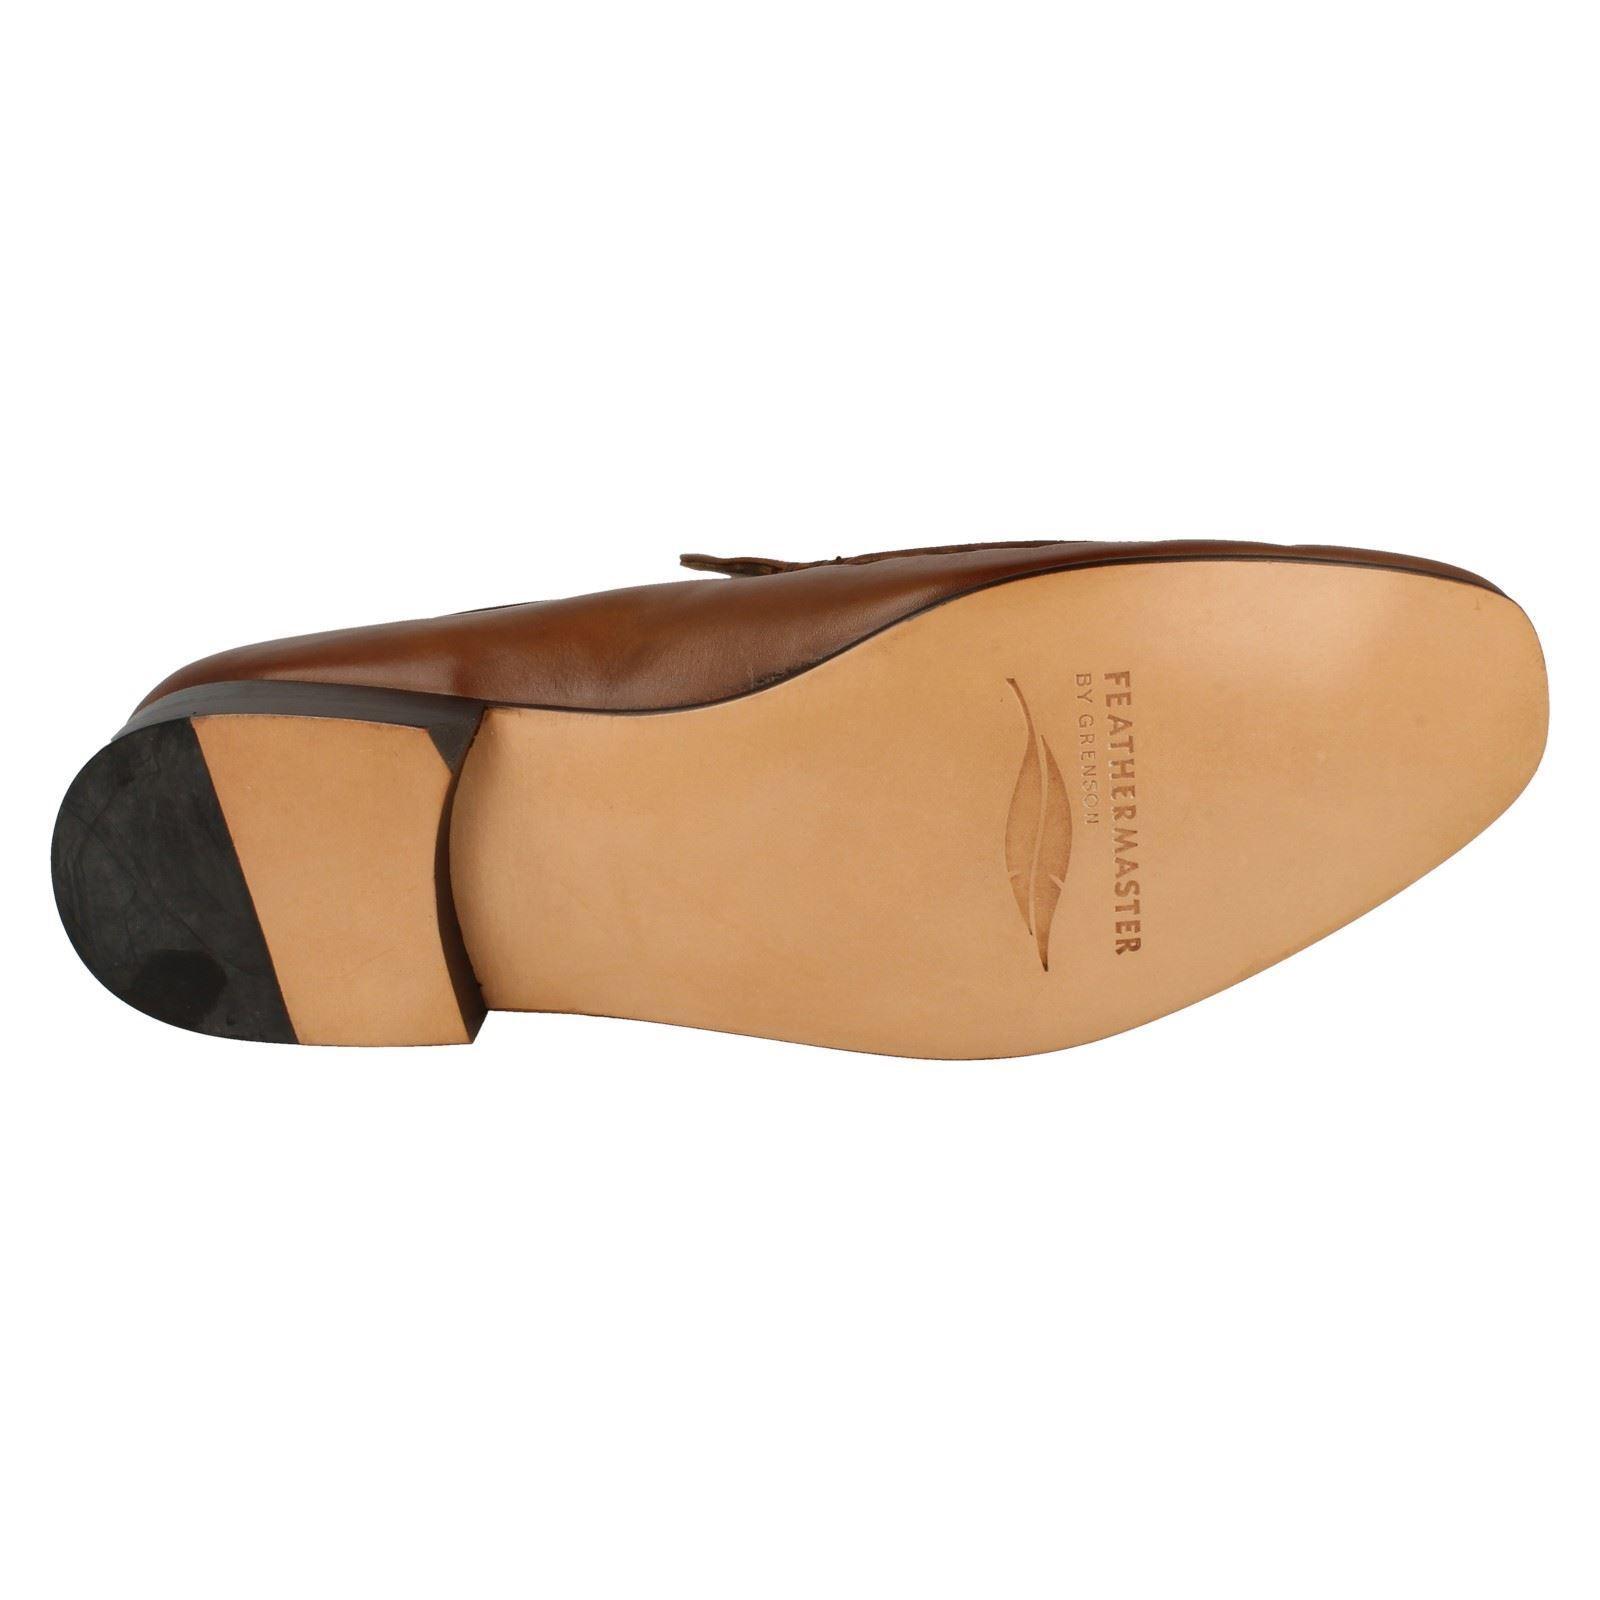 Mens Nevada Braun Leder slip on shoe by Grenson Feathermaster